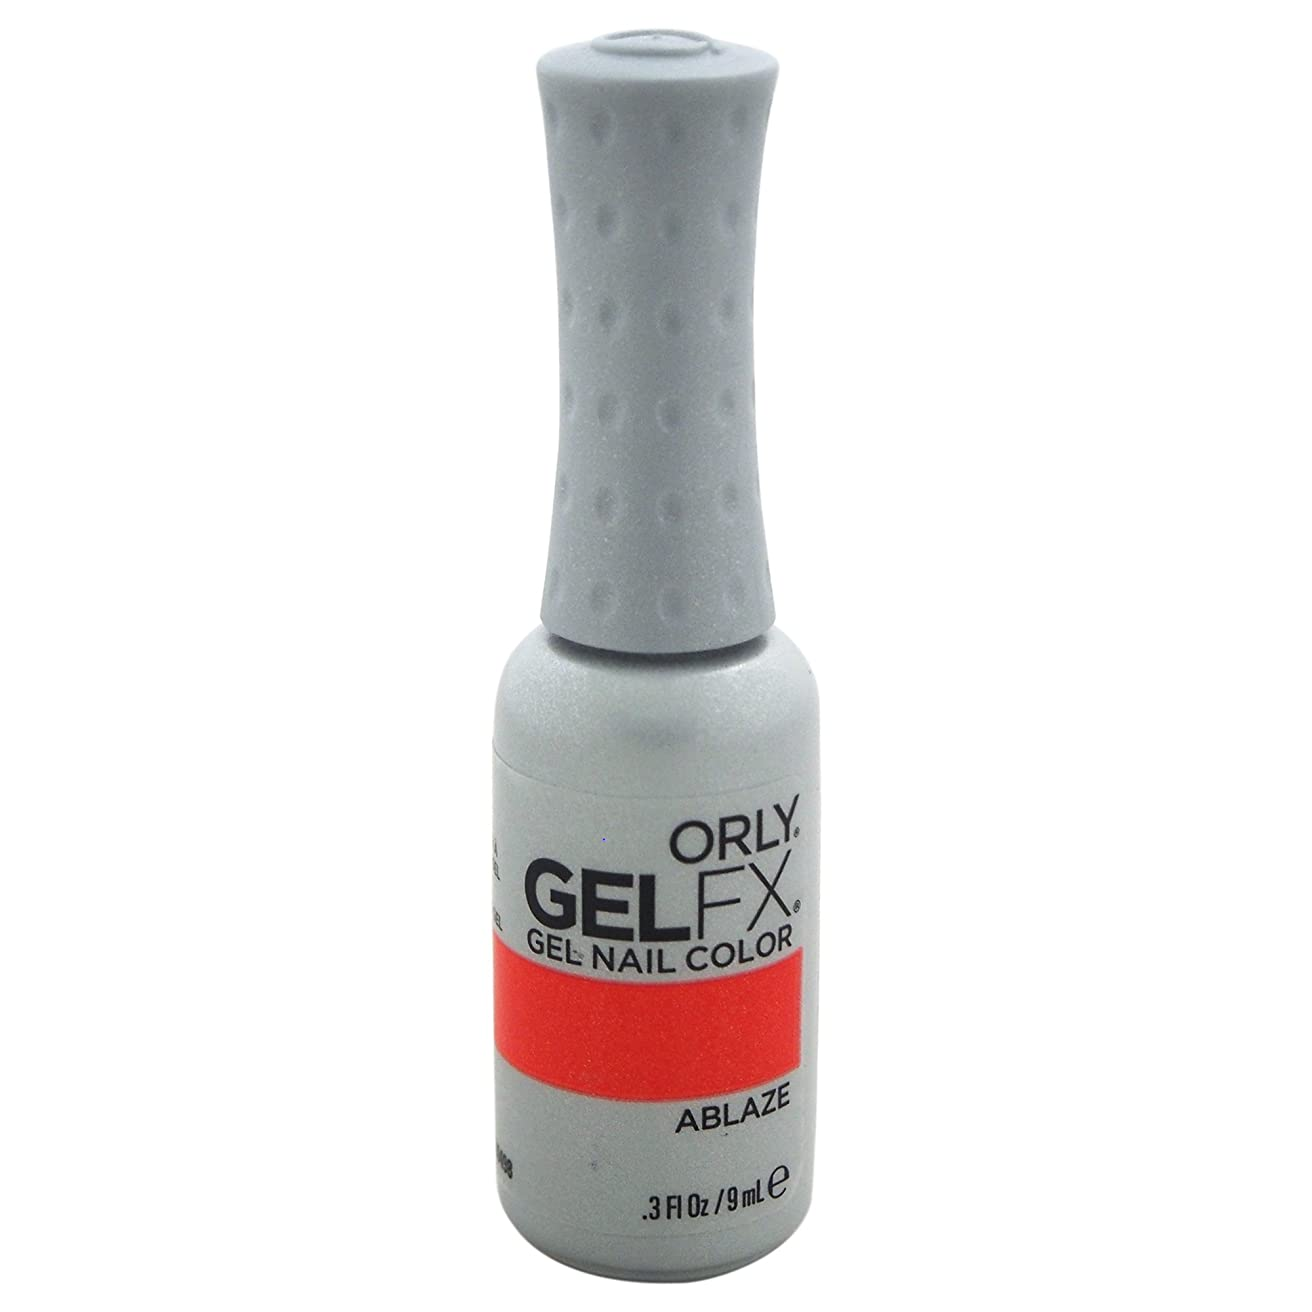 帝国失業売り手Orly GelFX Gel Polish - Ablaze - 0.3oz / 9ml